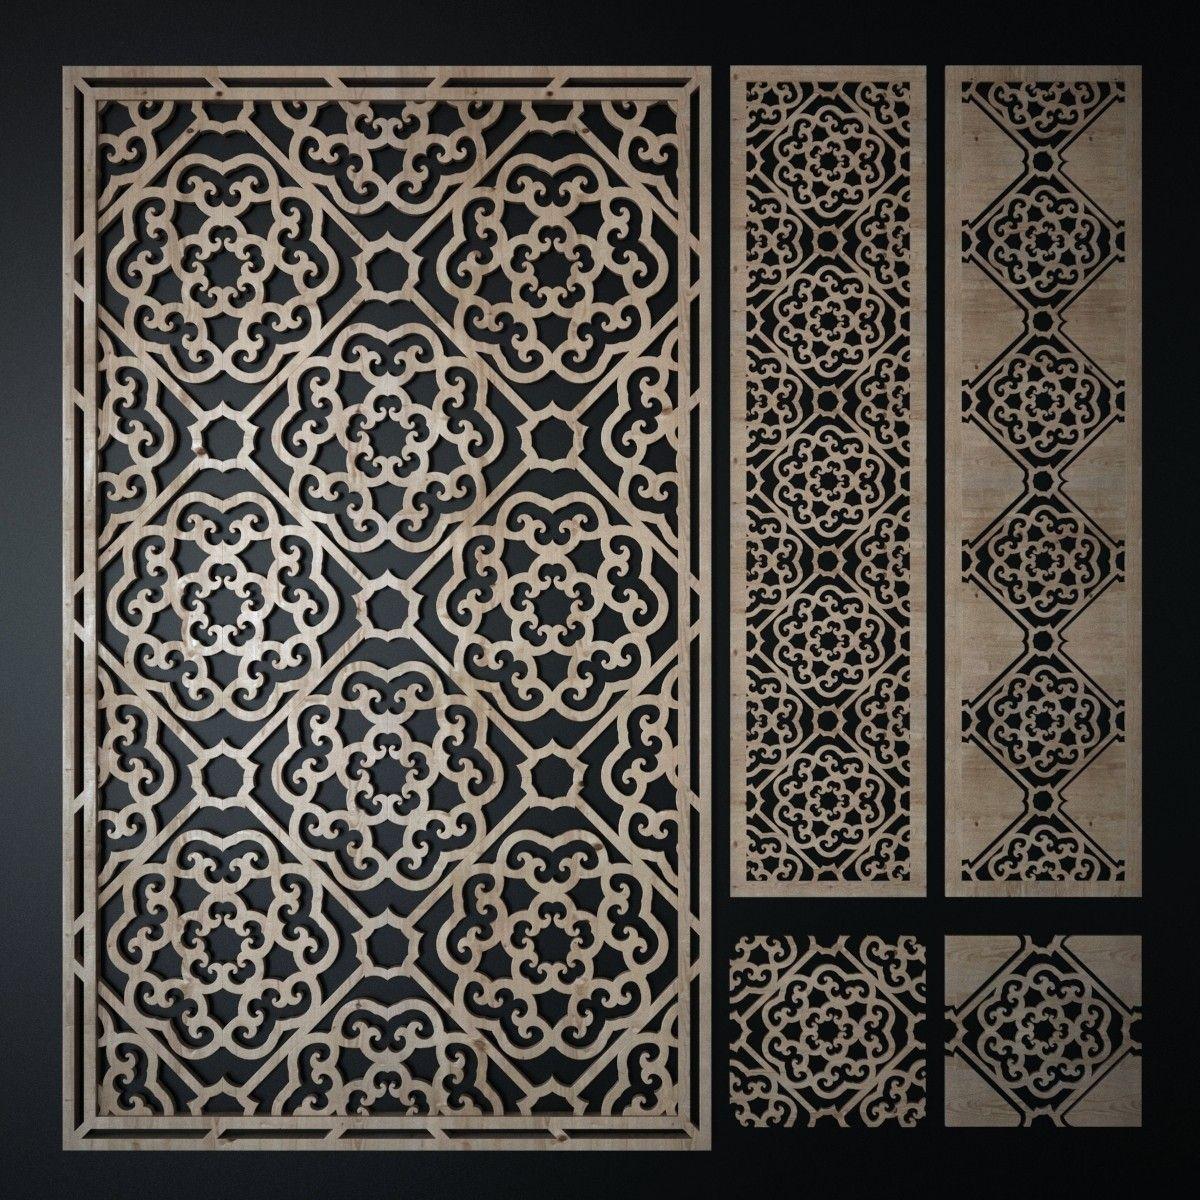 3d model decorative laser cutting pattern | Glowforge Idea\'s in 2018 ...